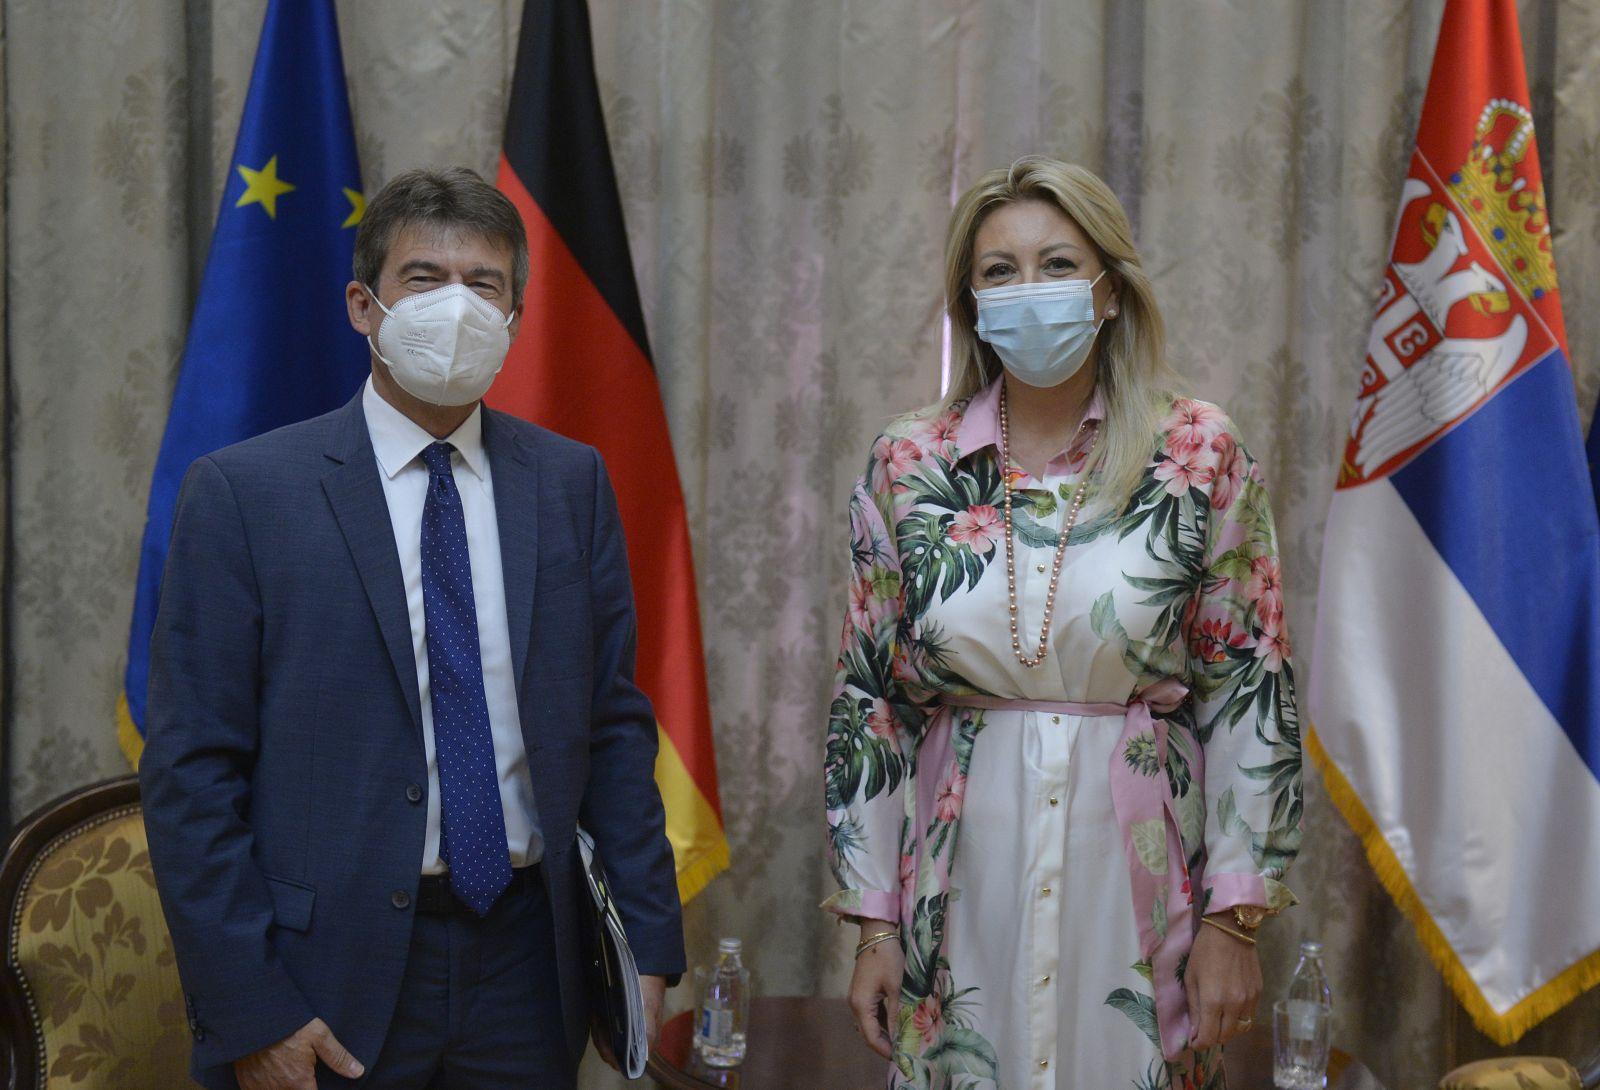 J. Joksimović and Müller: Germany provides development assistance for sustainable development